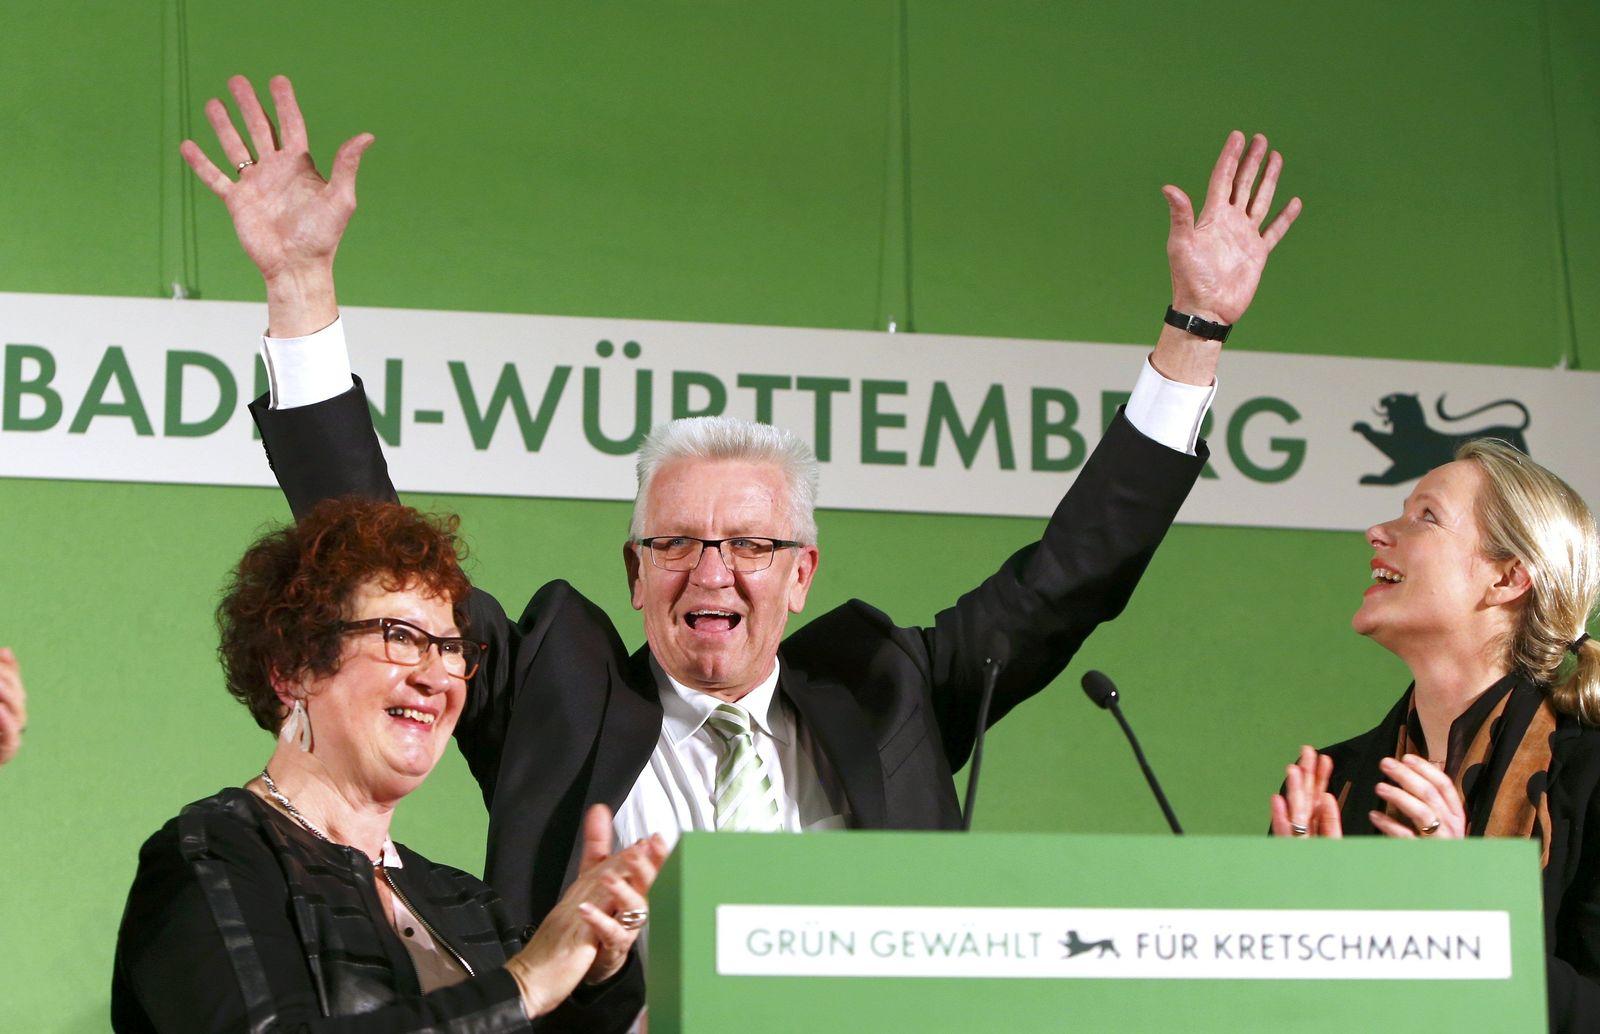 winfried kretschmann wird als bundesprasident gehandelt wofur steht er der spiegel